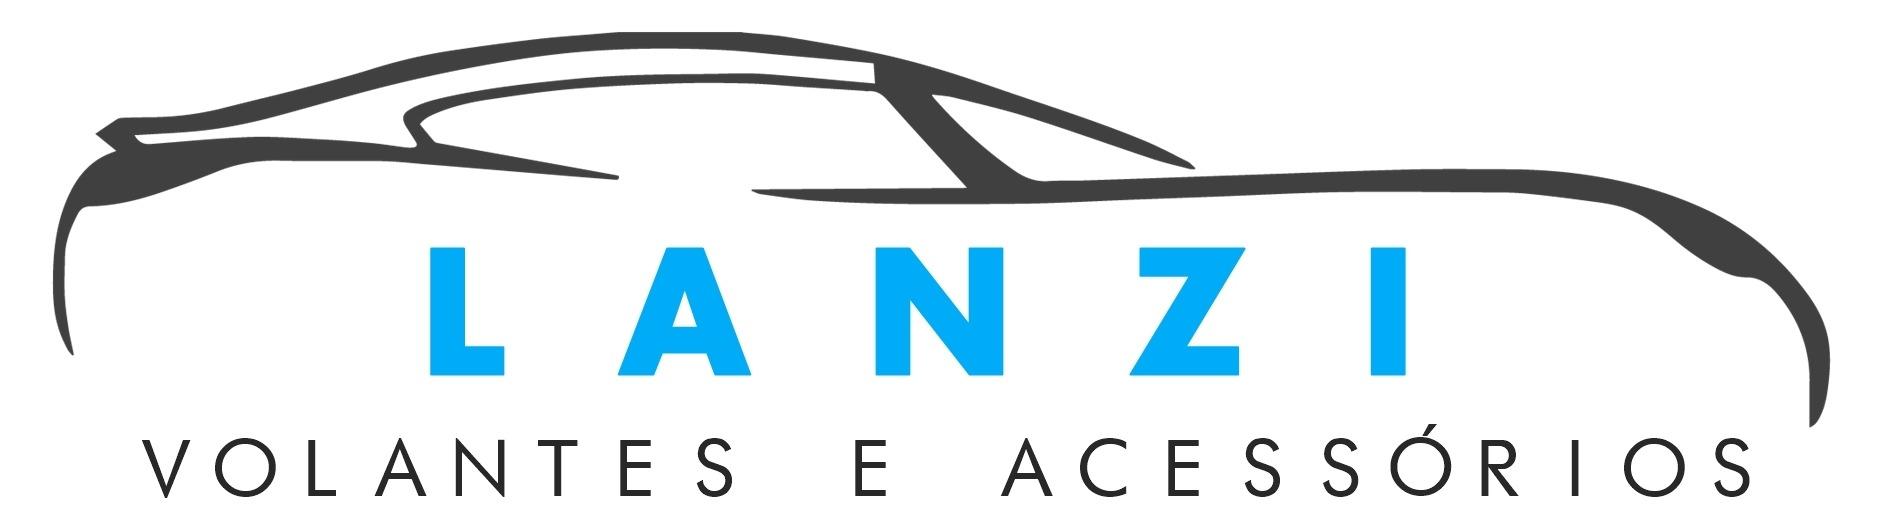 LANZI Volantes e Acessórios Automotivos